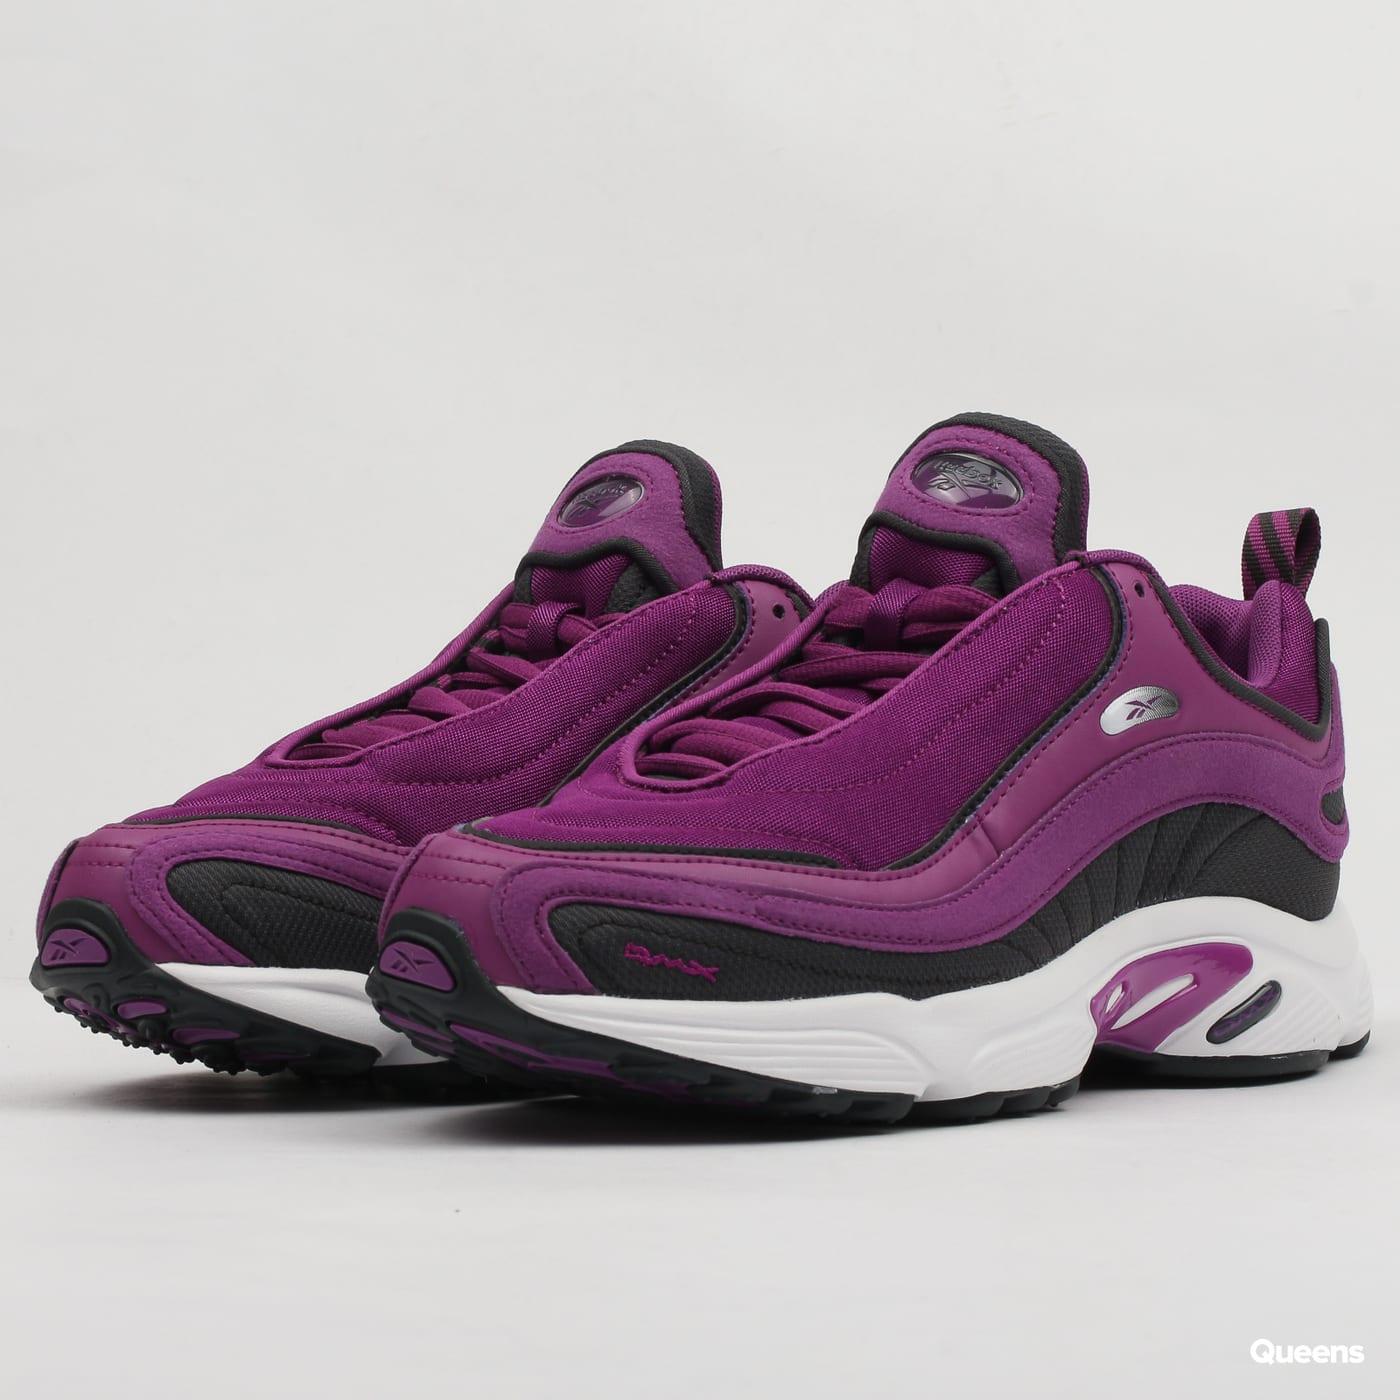 029a9805dfc Sneakers Reebok Daytona DMX MU (DV3733)– Queens 💚